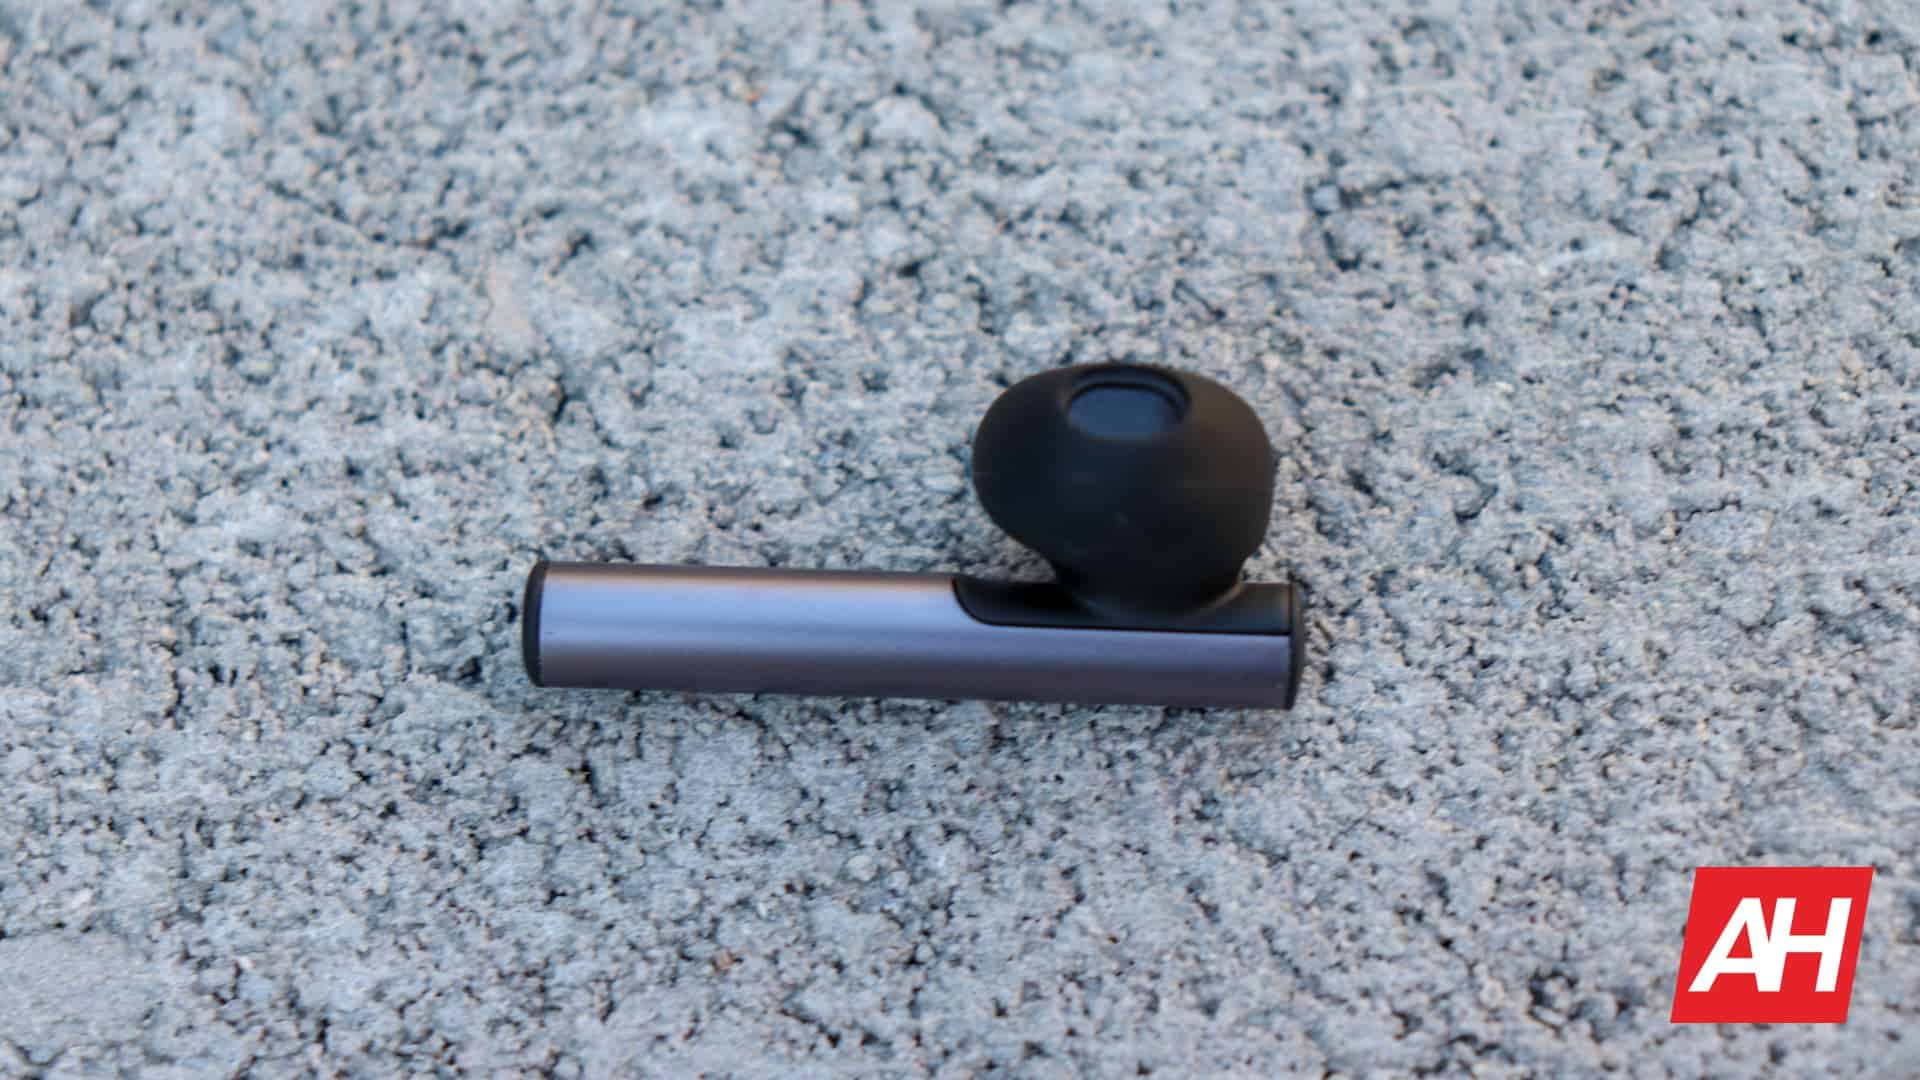 01 8 Oddict Twig Earbuds Hardware Review DG AH 2020